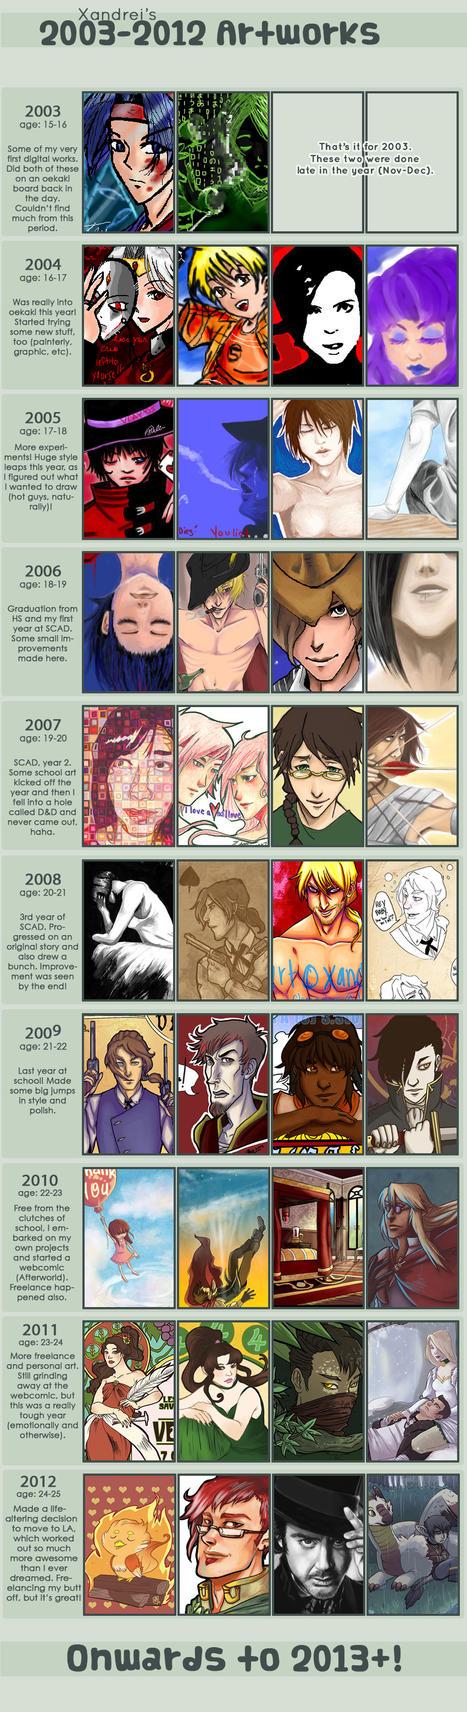 .Artistic Timelapse. by xandrei